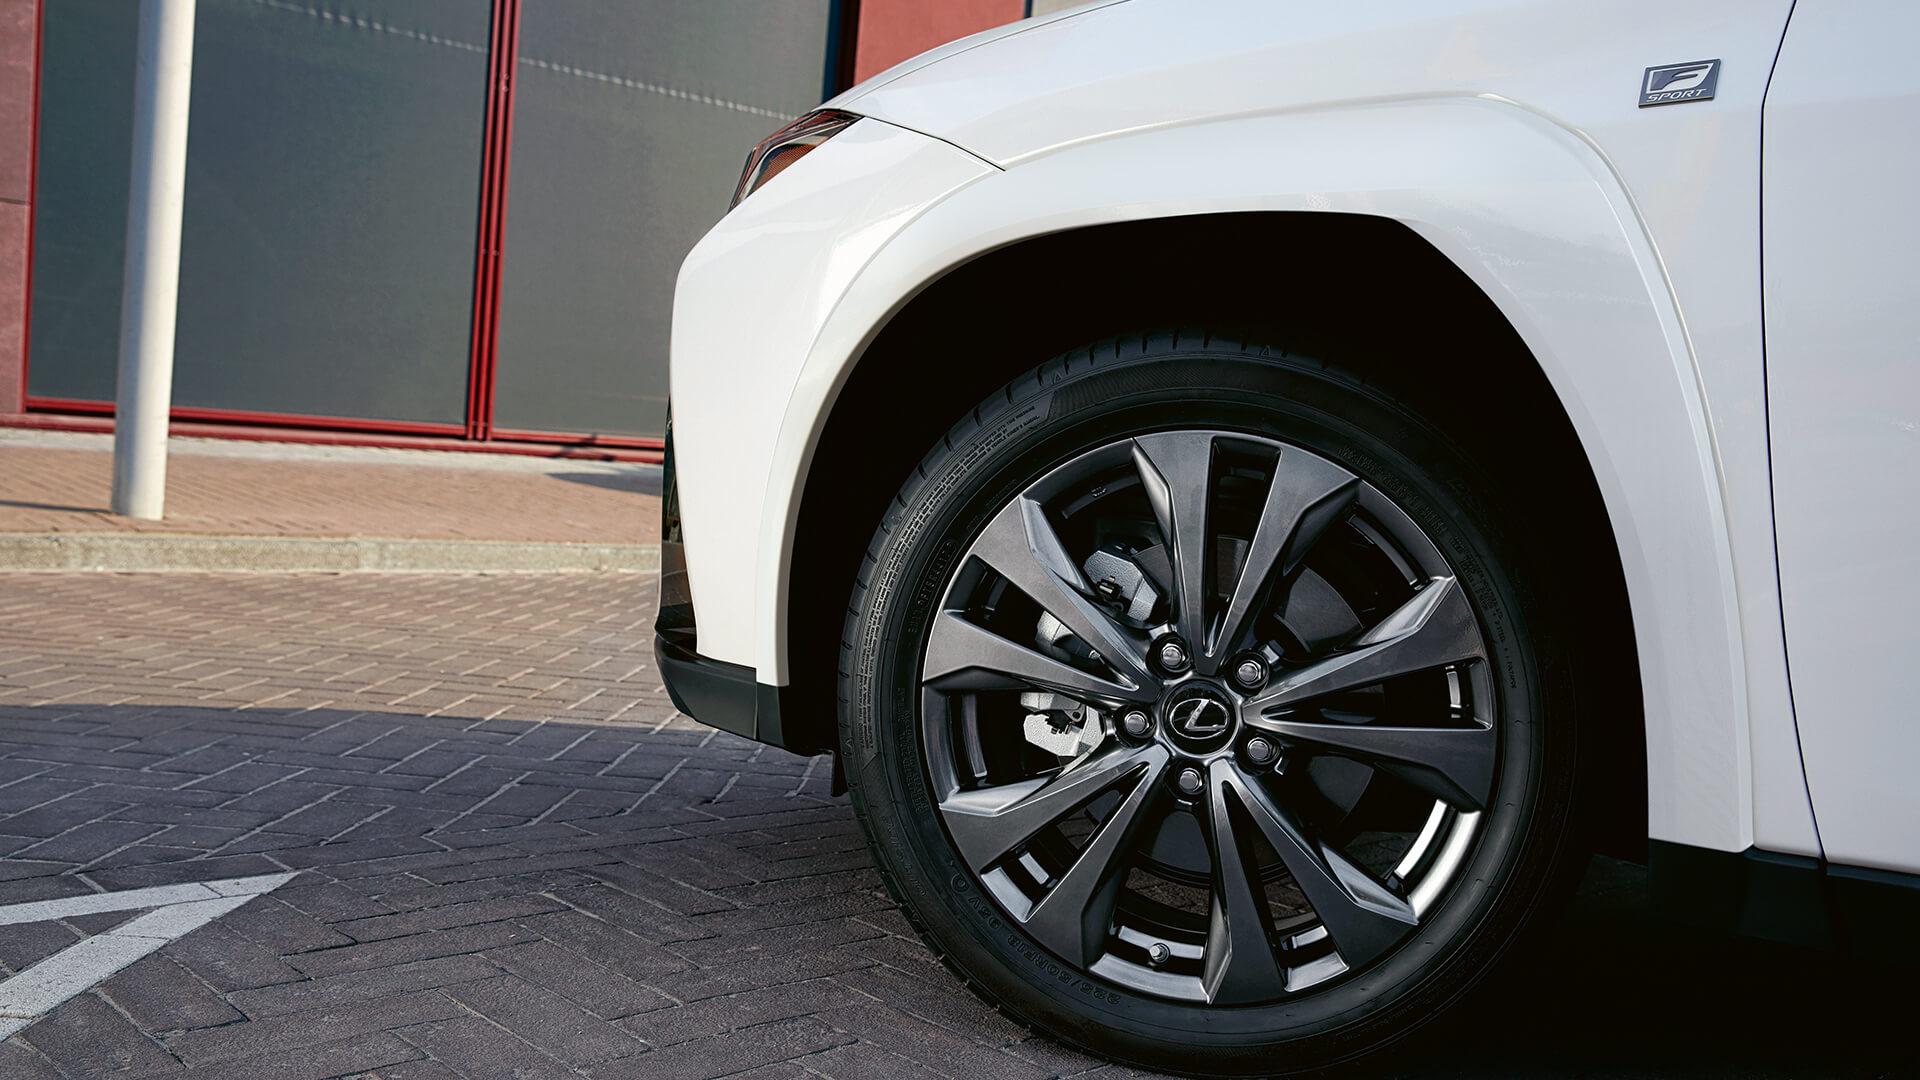 2022 lexus ux experience hotspot stabilising wheel arch